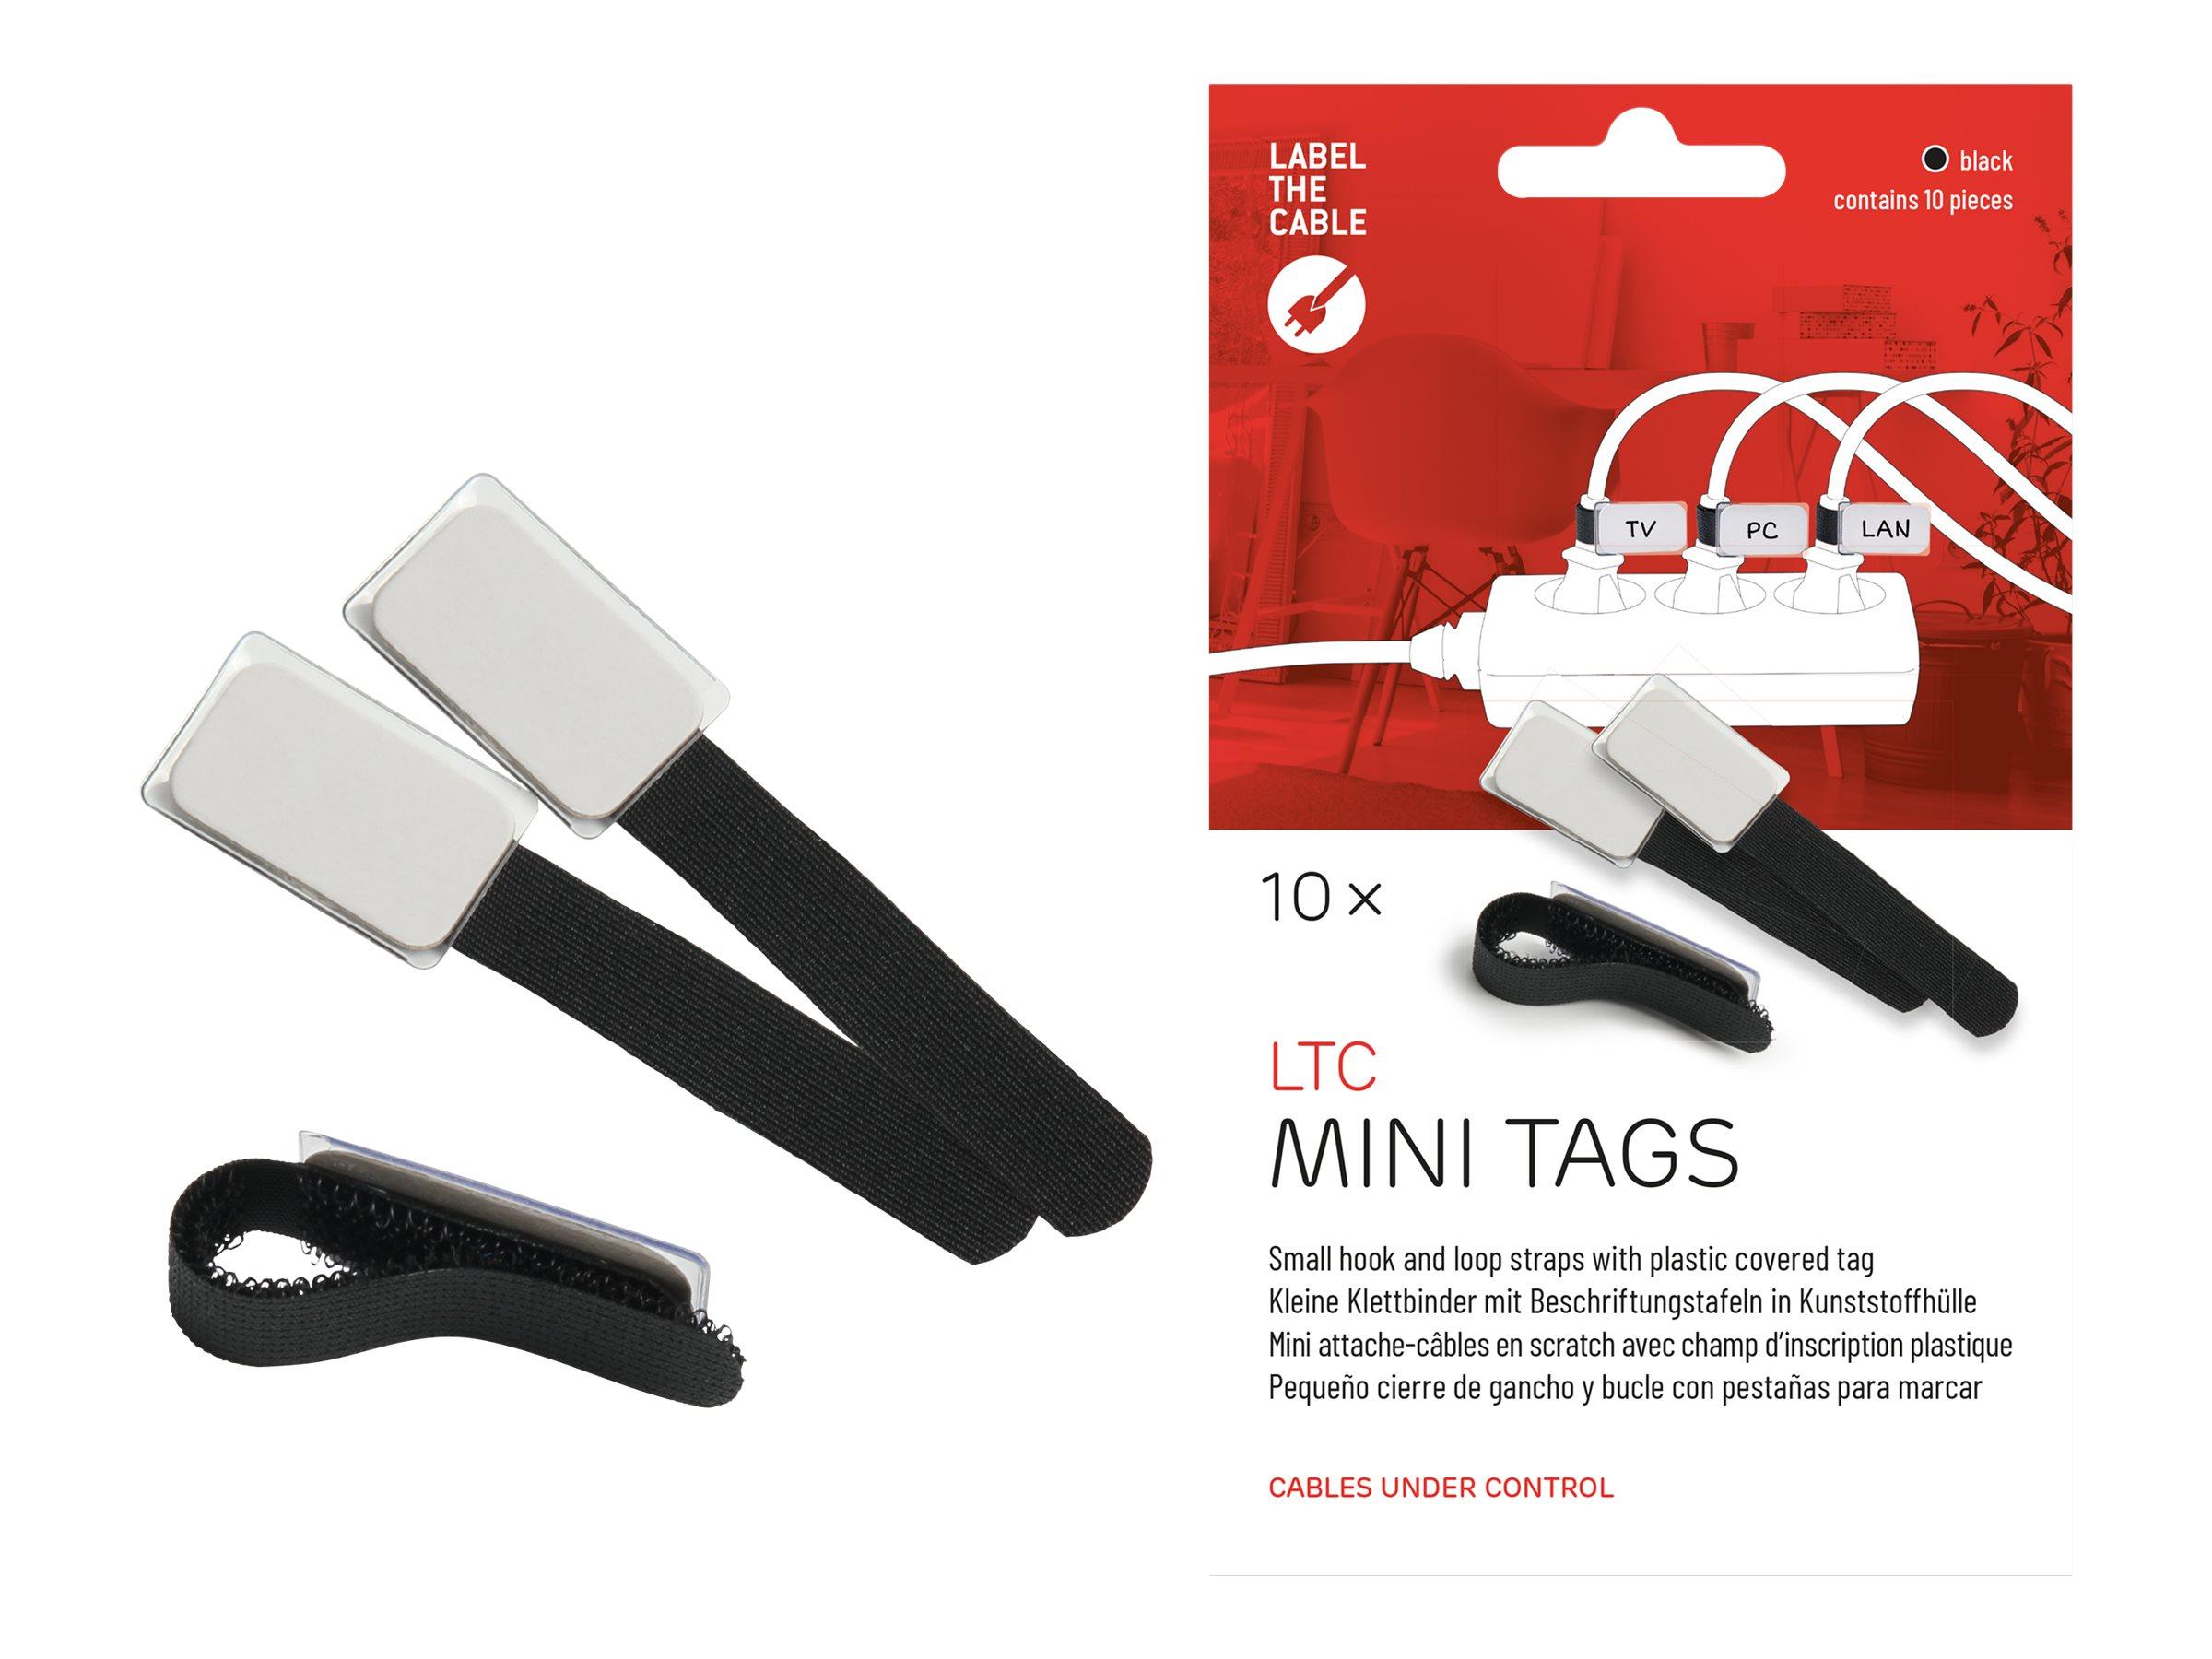 Label-the-cable LTC MINI TAGS - Draht-/Kabel-Marker - 9 cm - Schwarz (Packung mit 10)